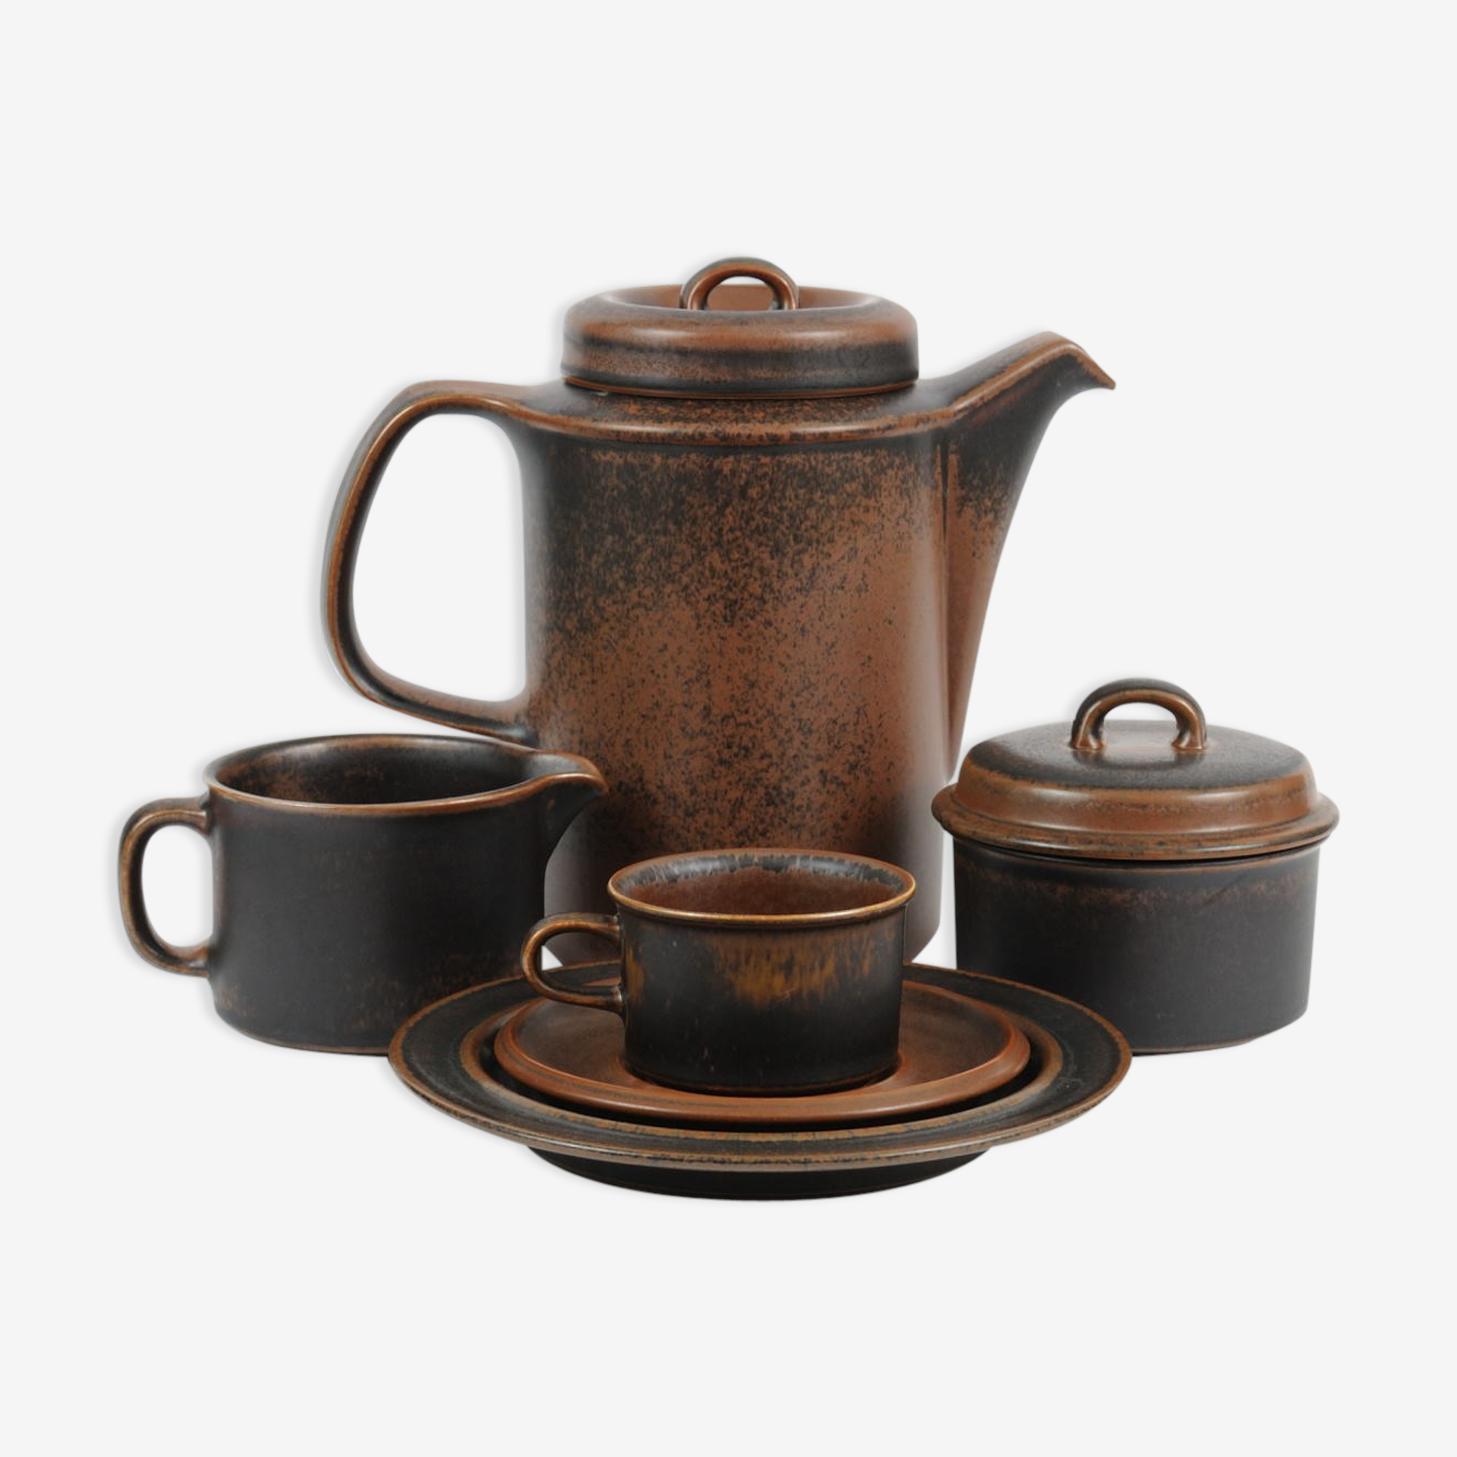 Ruska Coffee Set by Ulla Procope for Arabia, 1970s